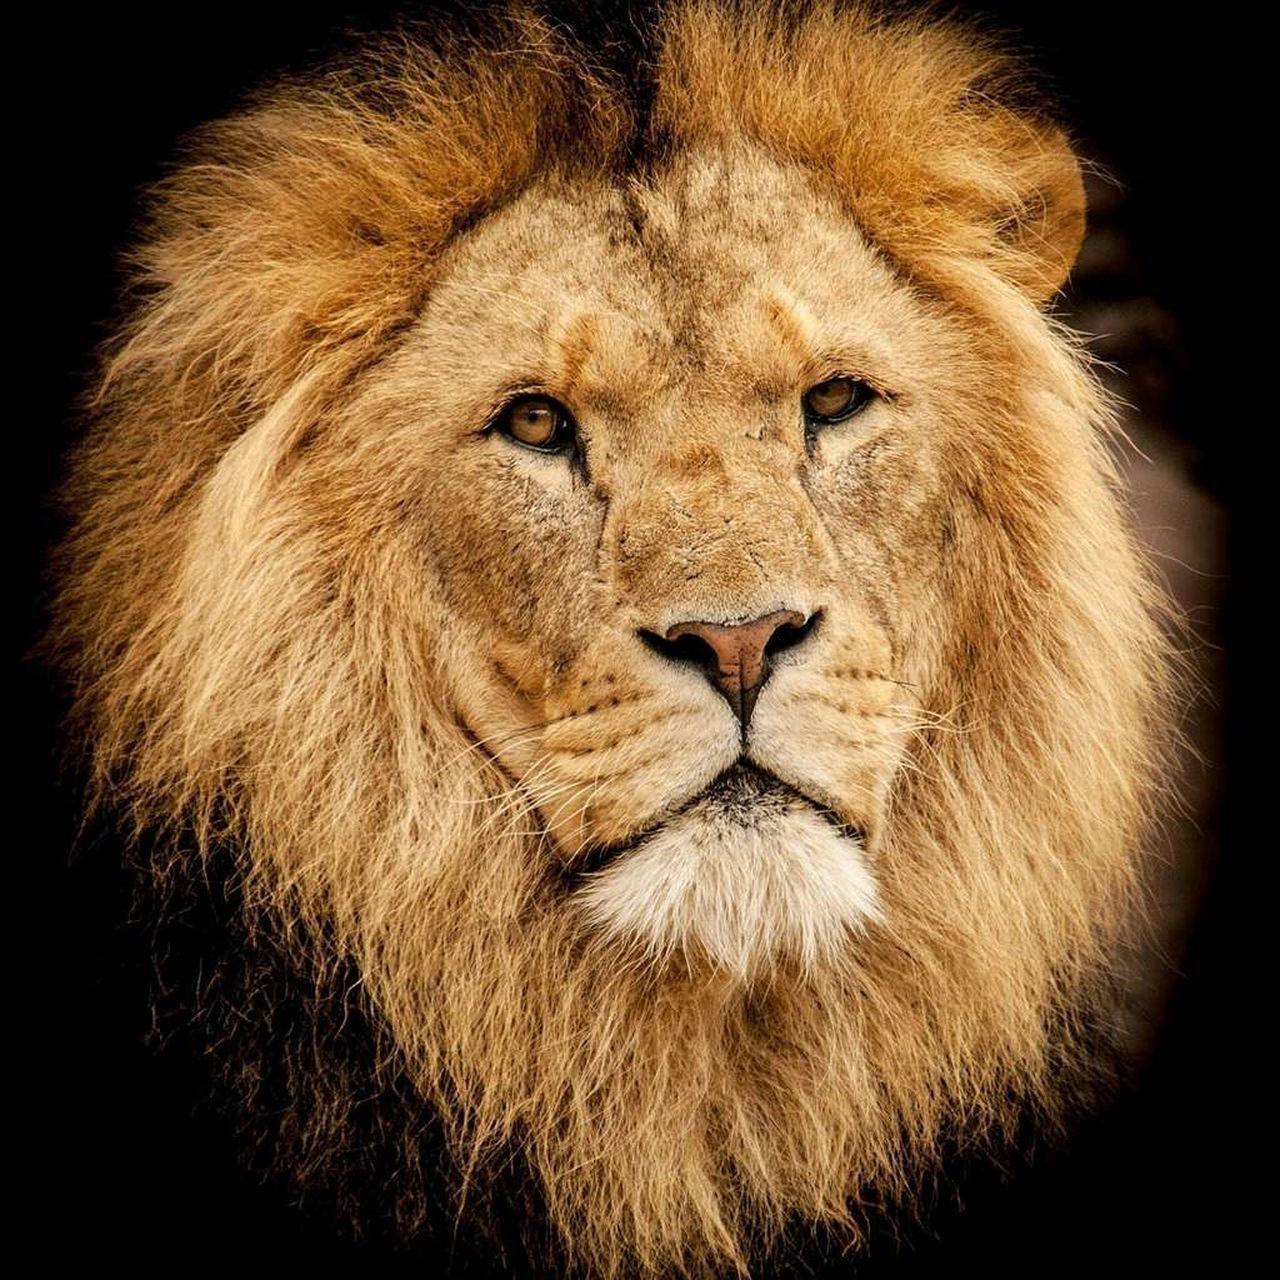 lion - feline, one animal, animal head, black background, animals in the wild, portrait, animal wildlife, no people, animal themes, close-up, feline, night, mammal, safari animals, outdoors